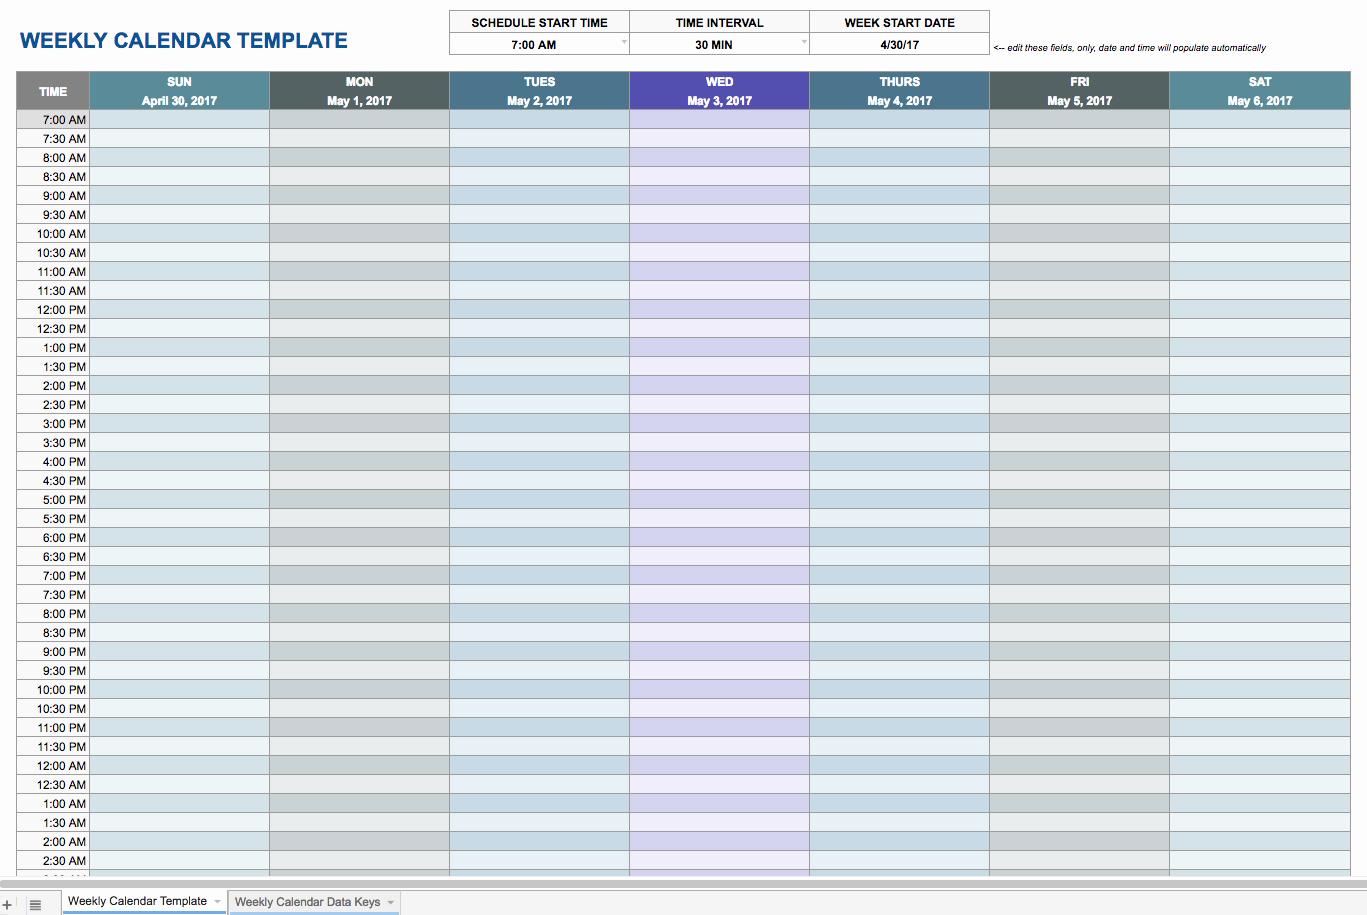 Checklist Template Google Docs Fresh Weekly Schedule Template Google Docs